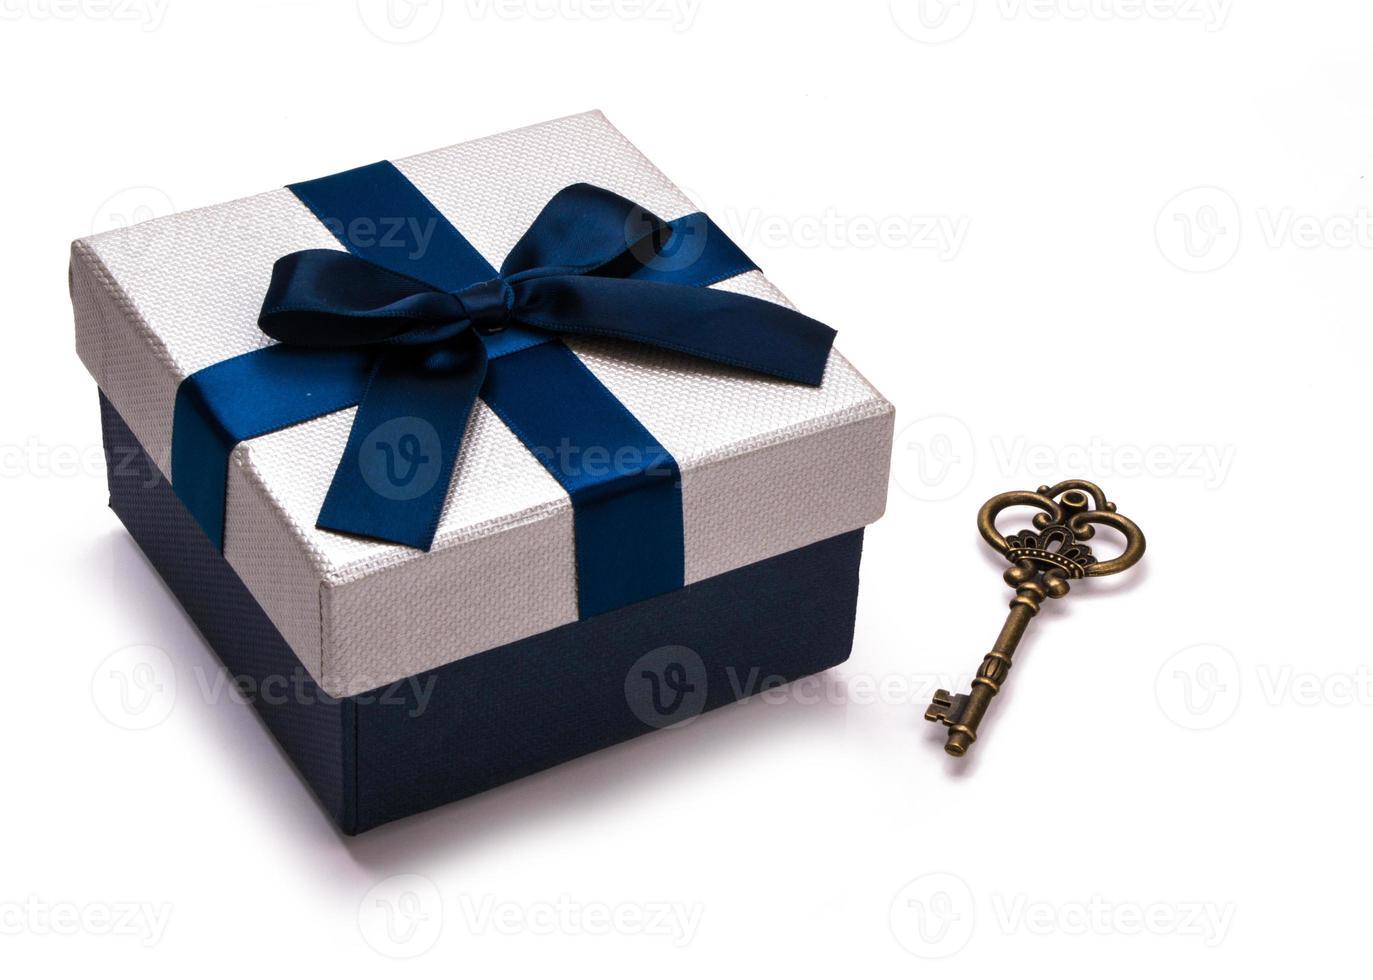 caixa de presente e chave vintage foto